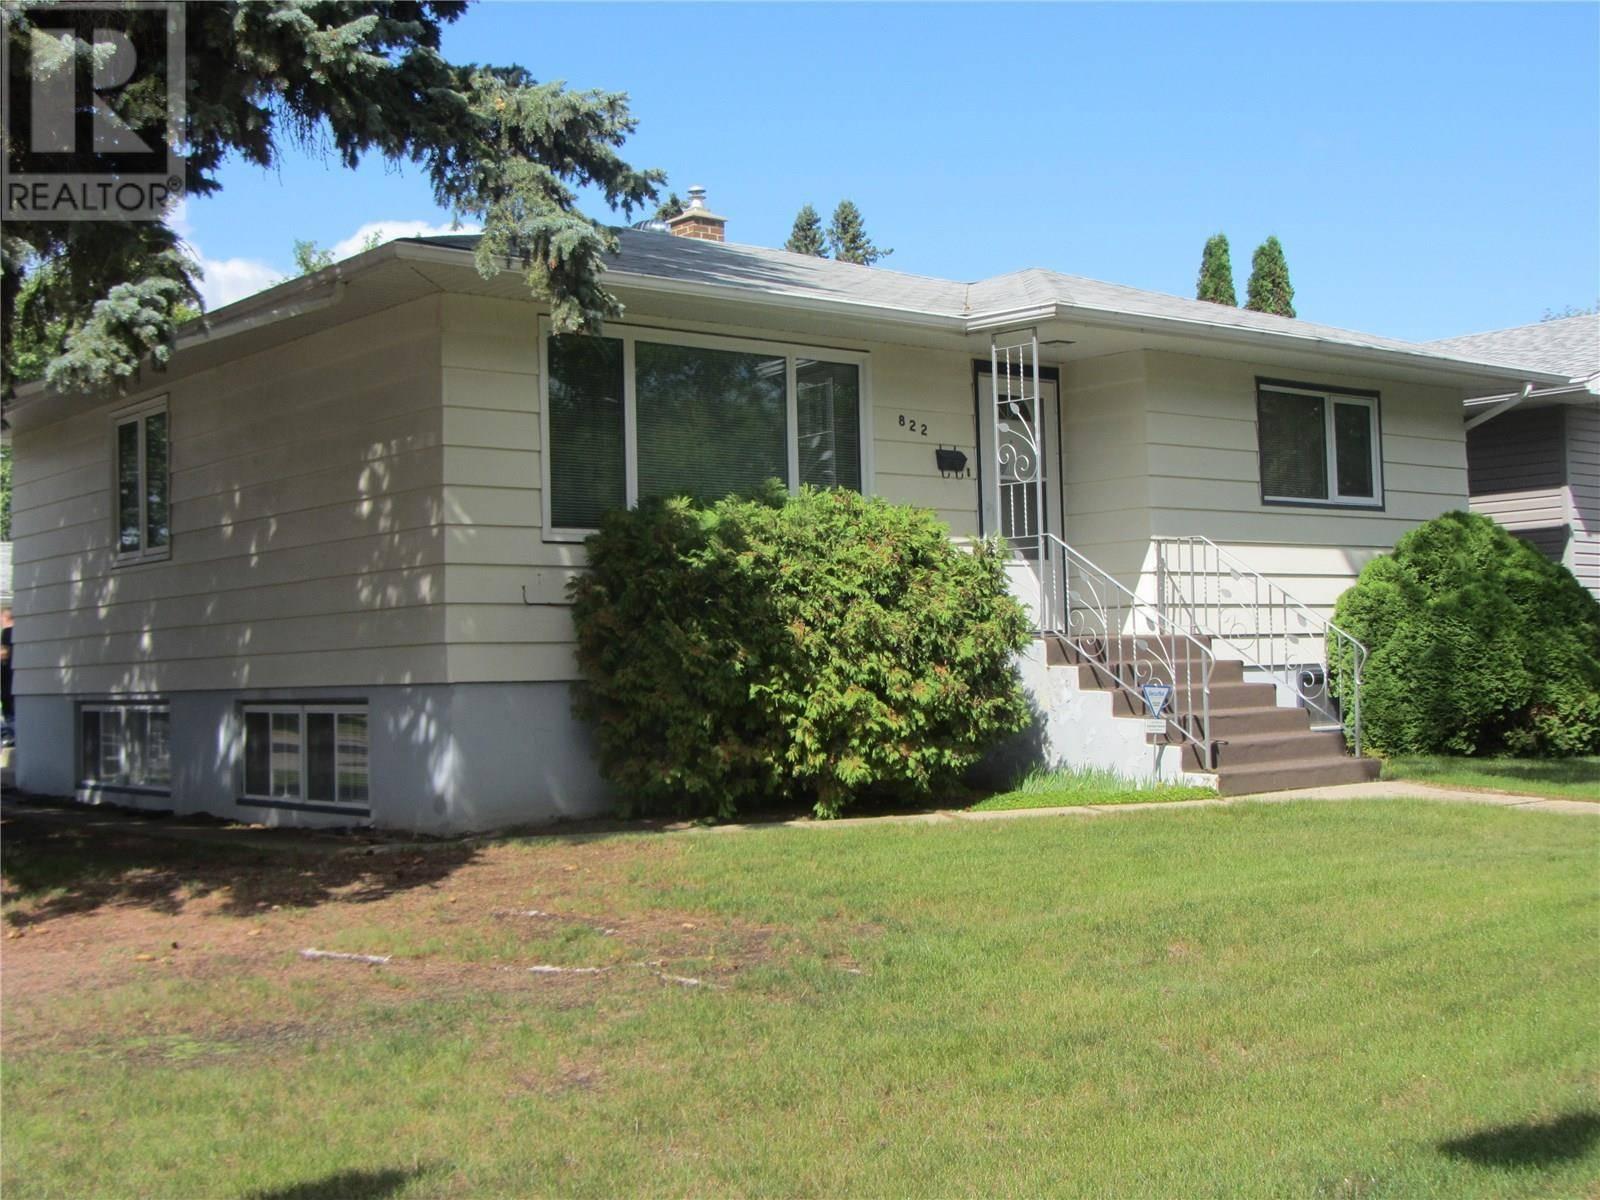 House for sale at 822 31st St W Saskatoon Saskatchewan - MLS: SK781192